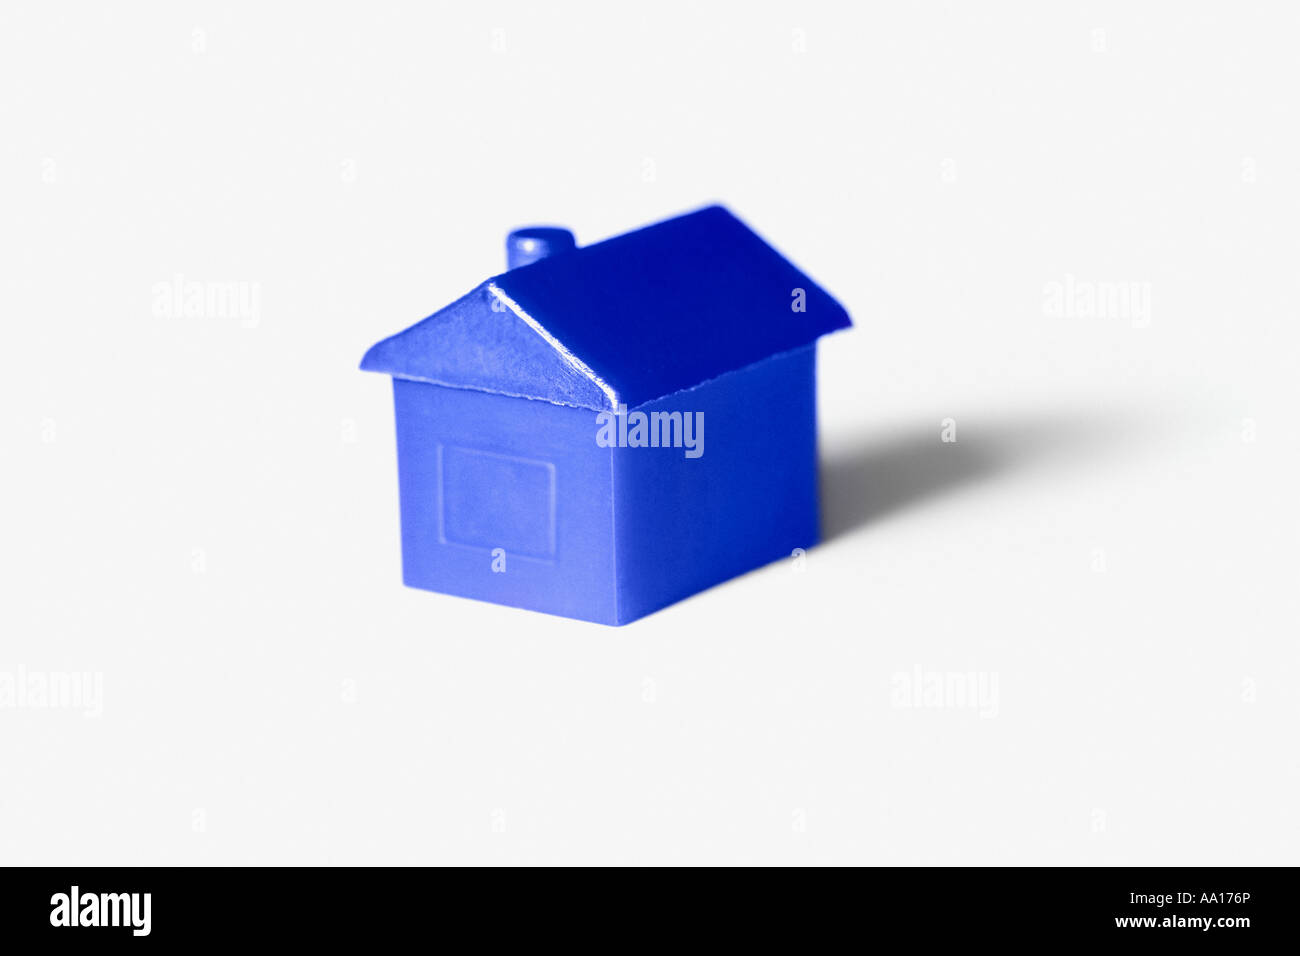 Blue model house - Stock Image